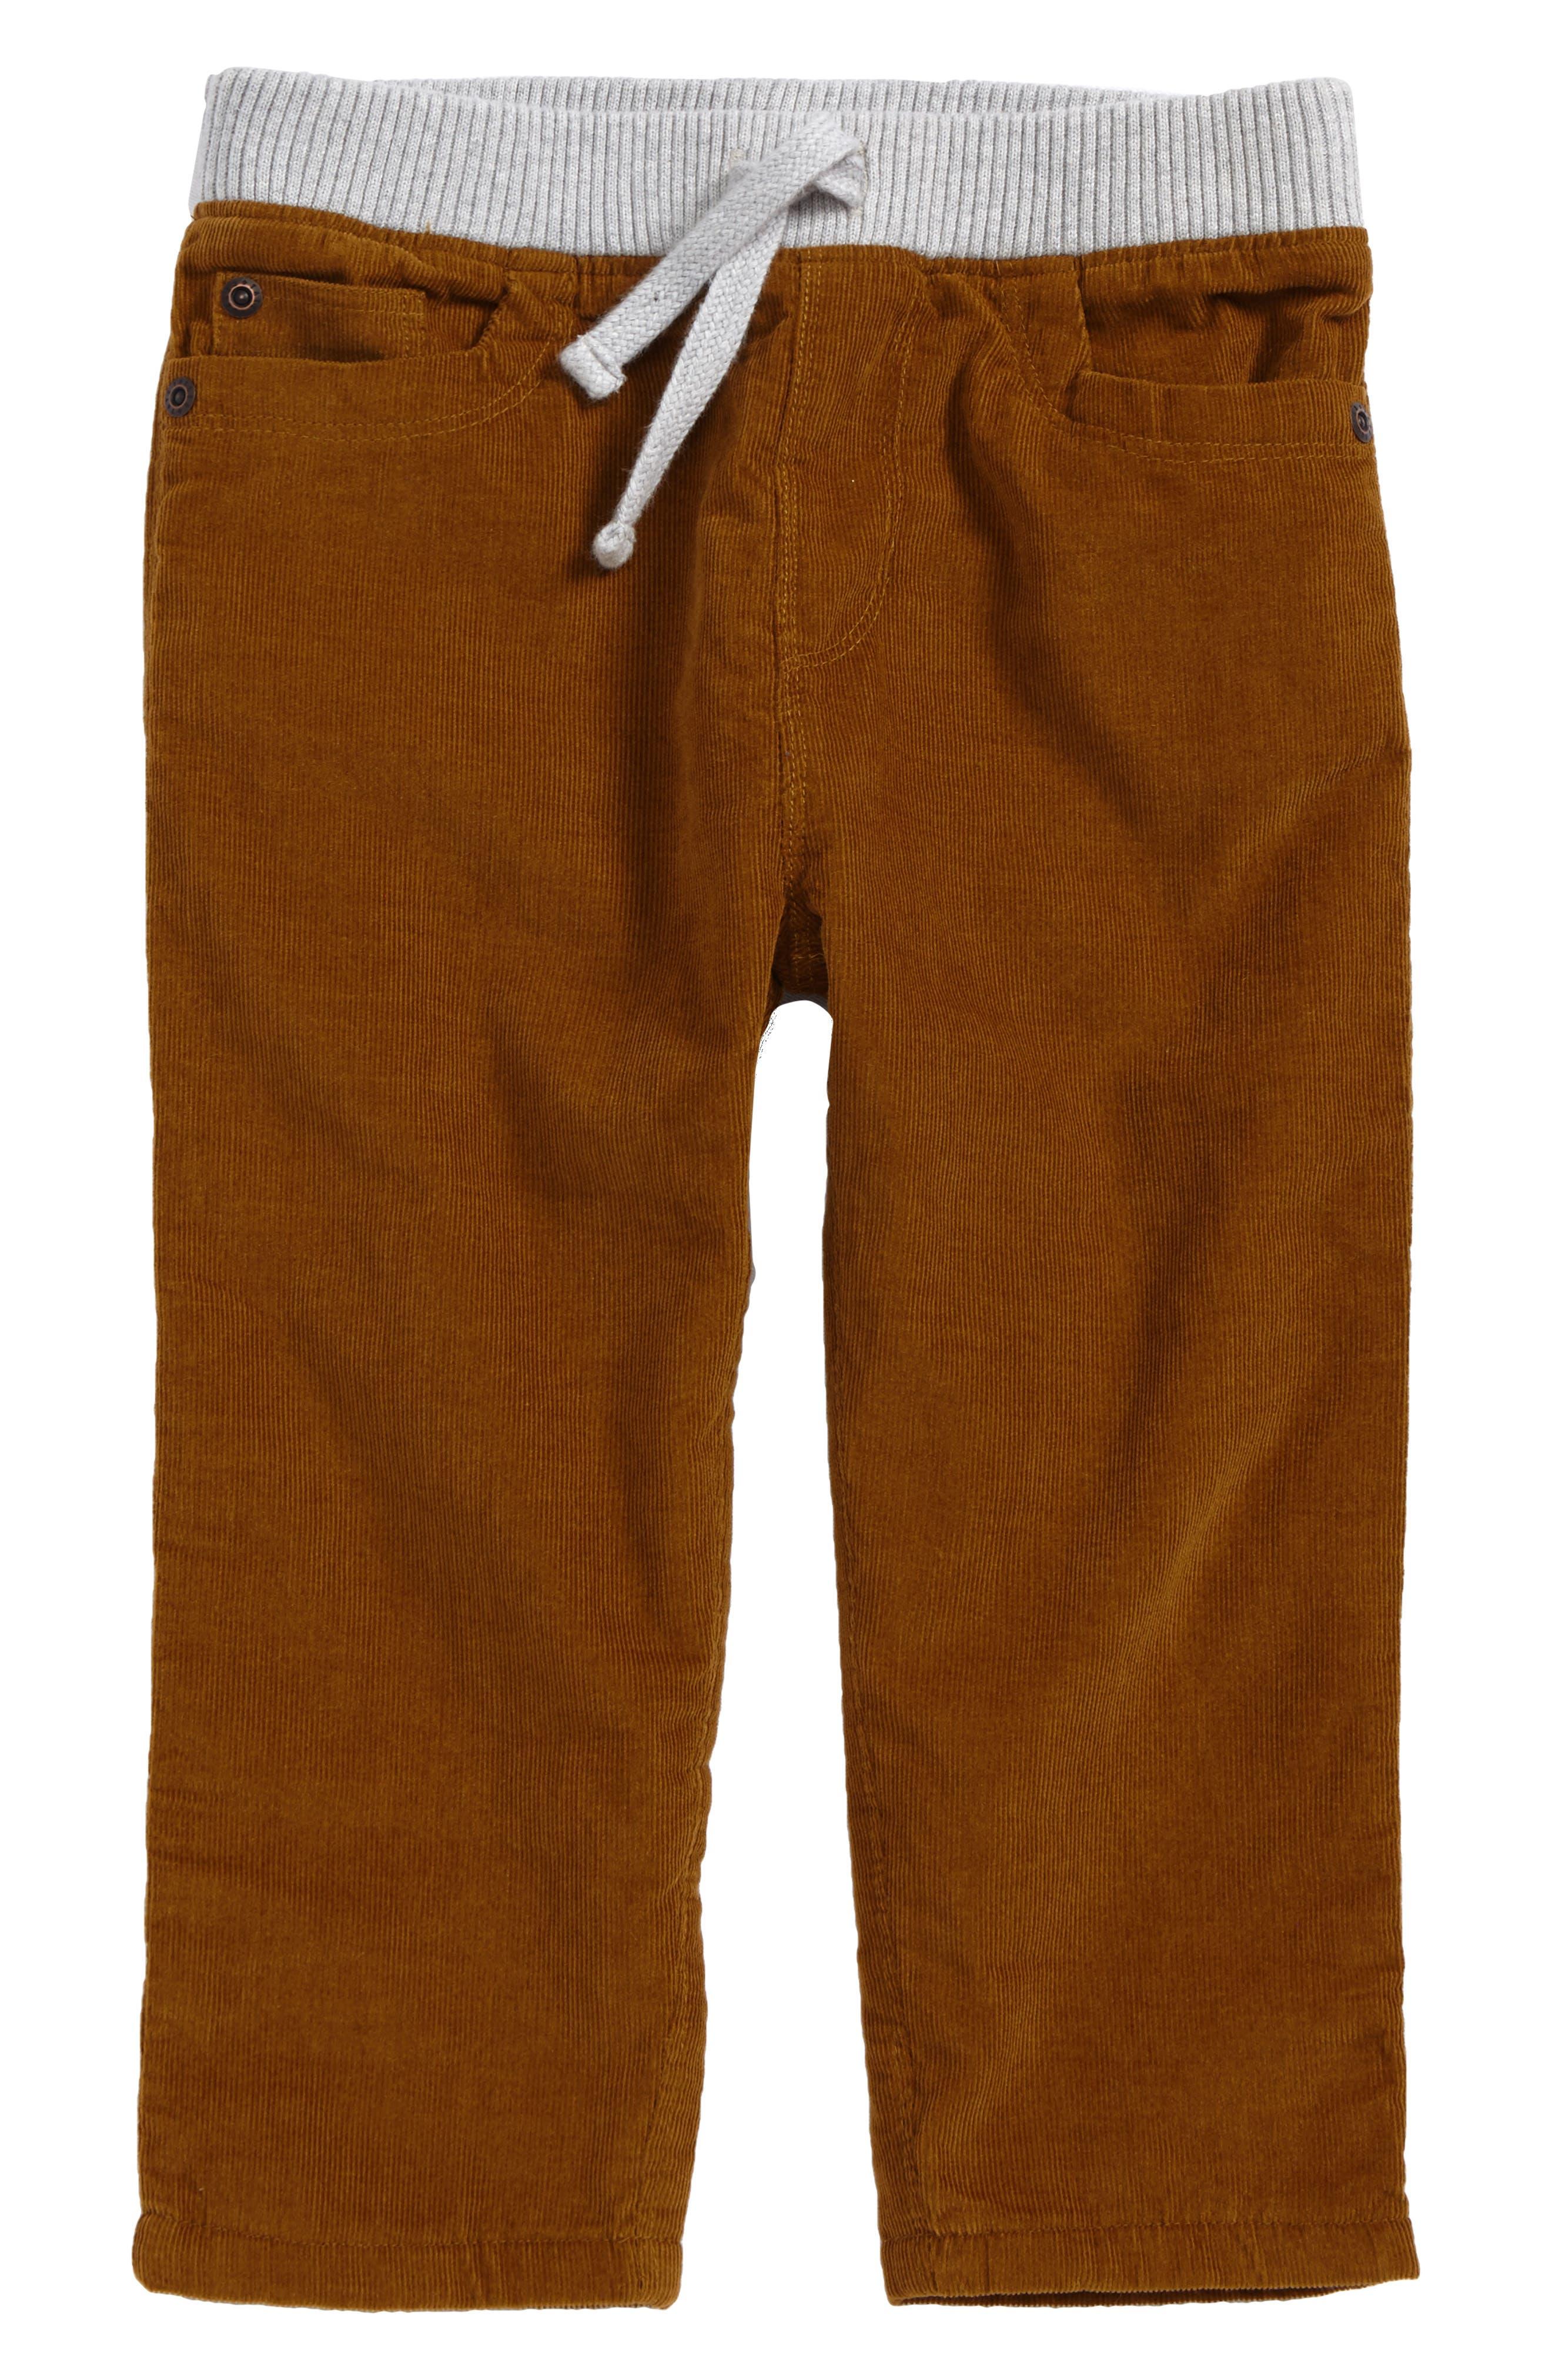 Main Image - Tucker + Tate Corduroy Pants (Baby Boys)